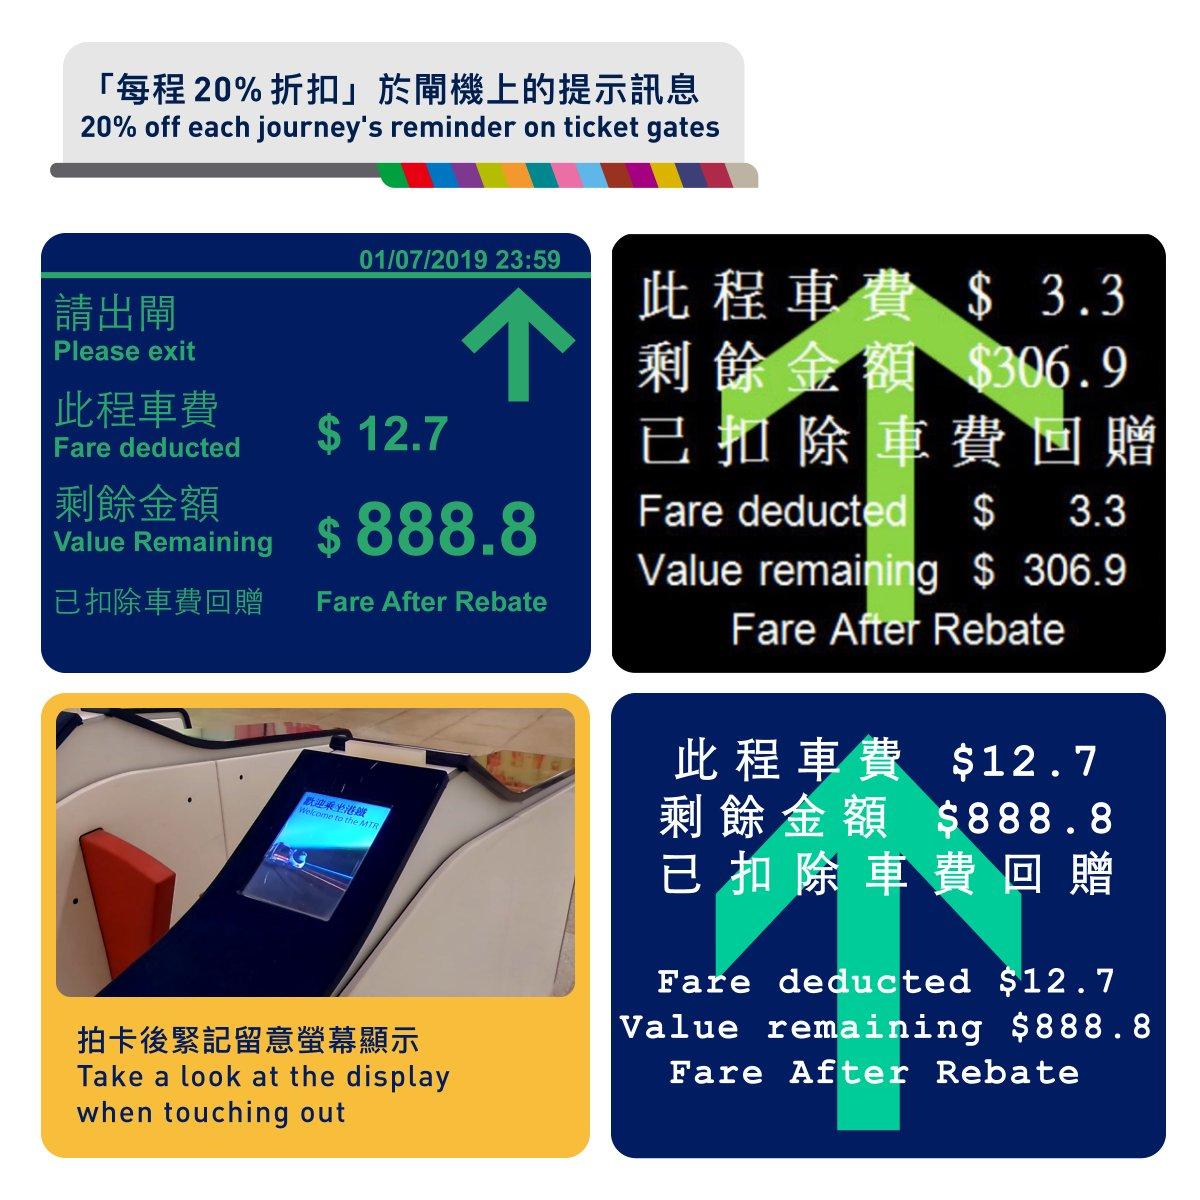 MTR Service Update@2020-07-02 05:16 (Thu)   實時資訊 香港一站式 ♿ 無障礙資訊平臺 無障礙旅遊指南 Free Guider